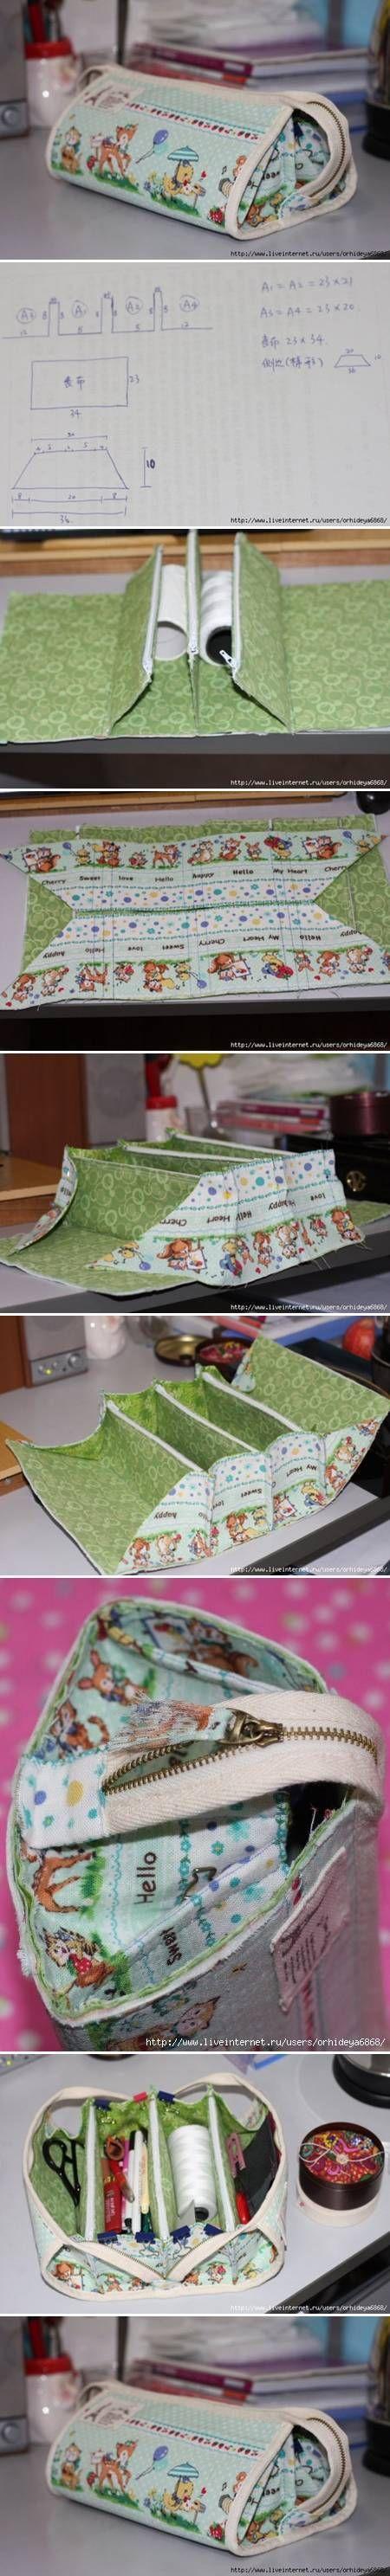 bag sew together 1-5 pdf-L